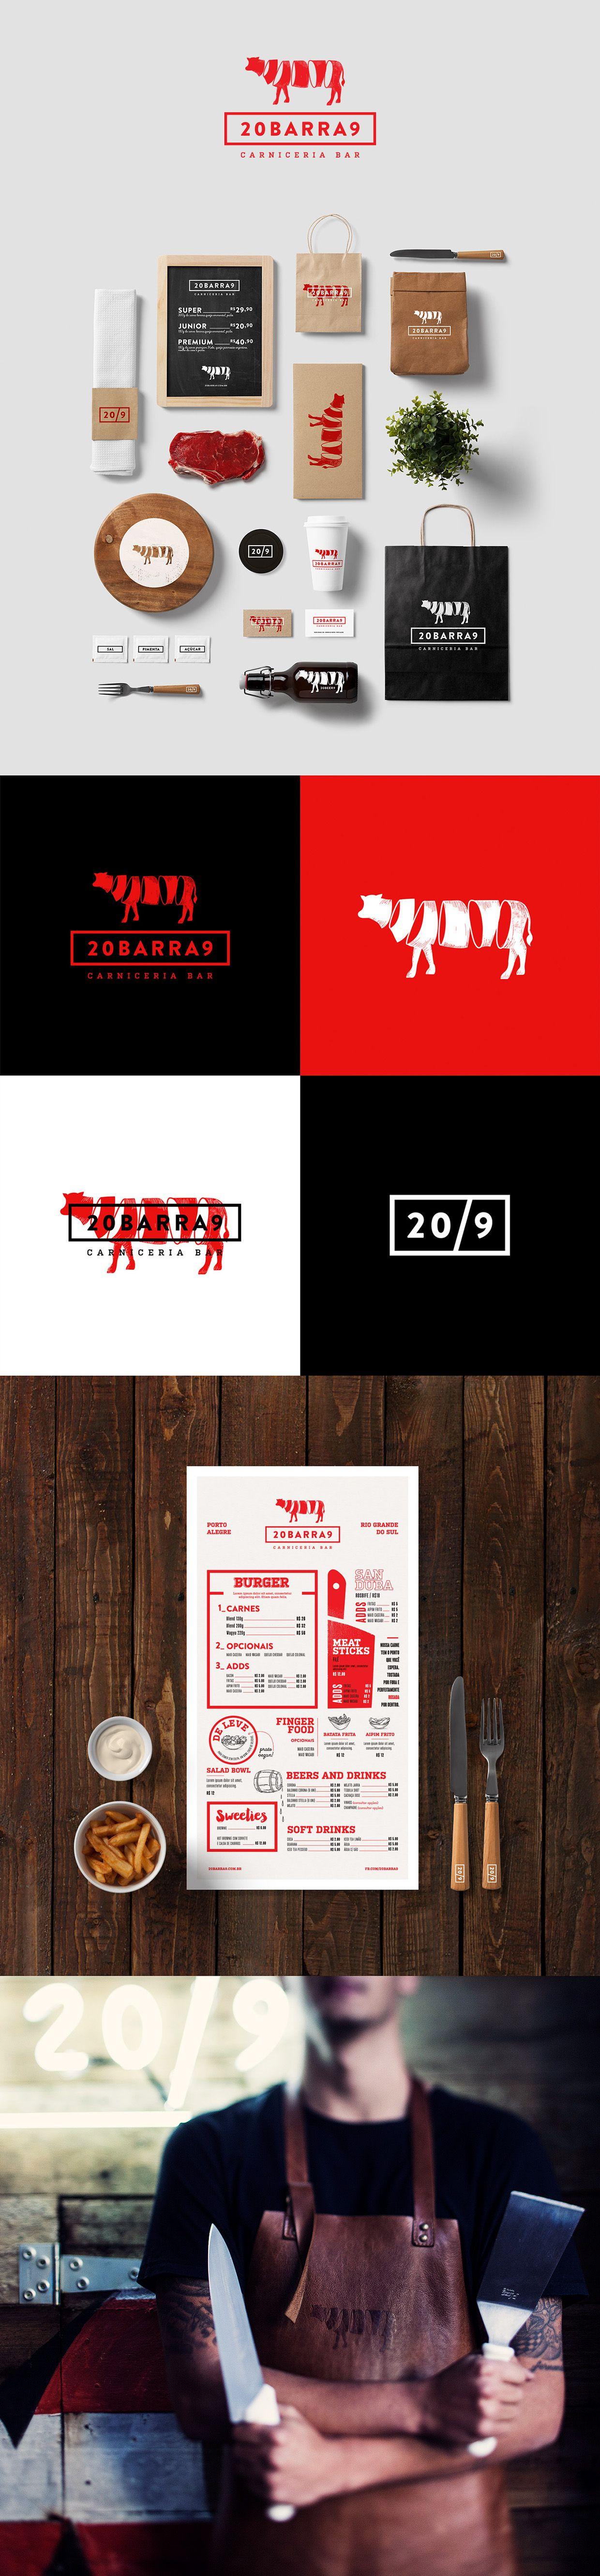 20barra9 On Behance Graphic Design Branding Logo Restaurant Brand Identity Design